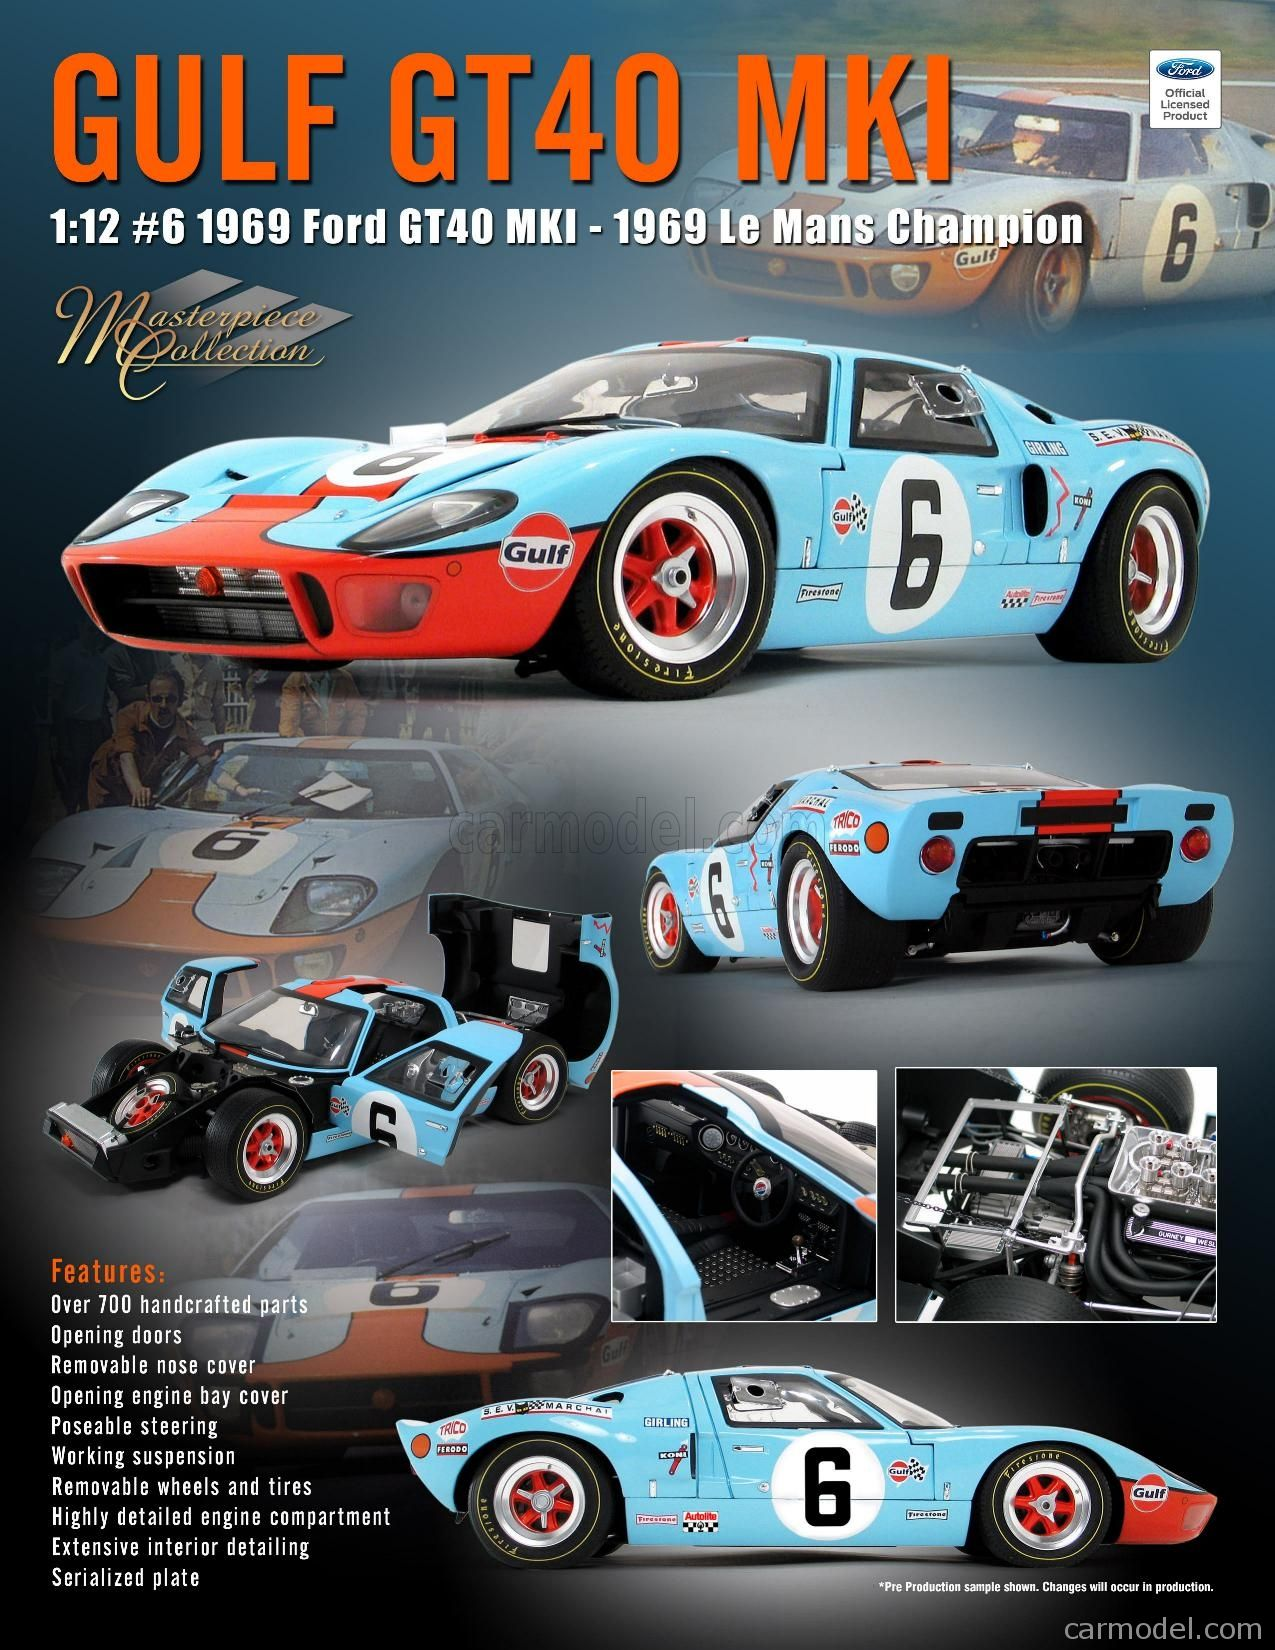 Ford Usa Gt40 4 9l V8 Team Jw Automotive Engineering N 6 Winner